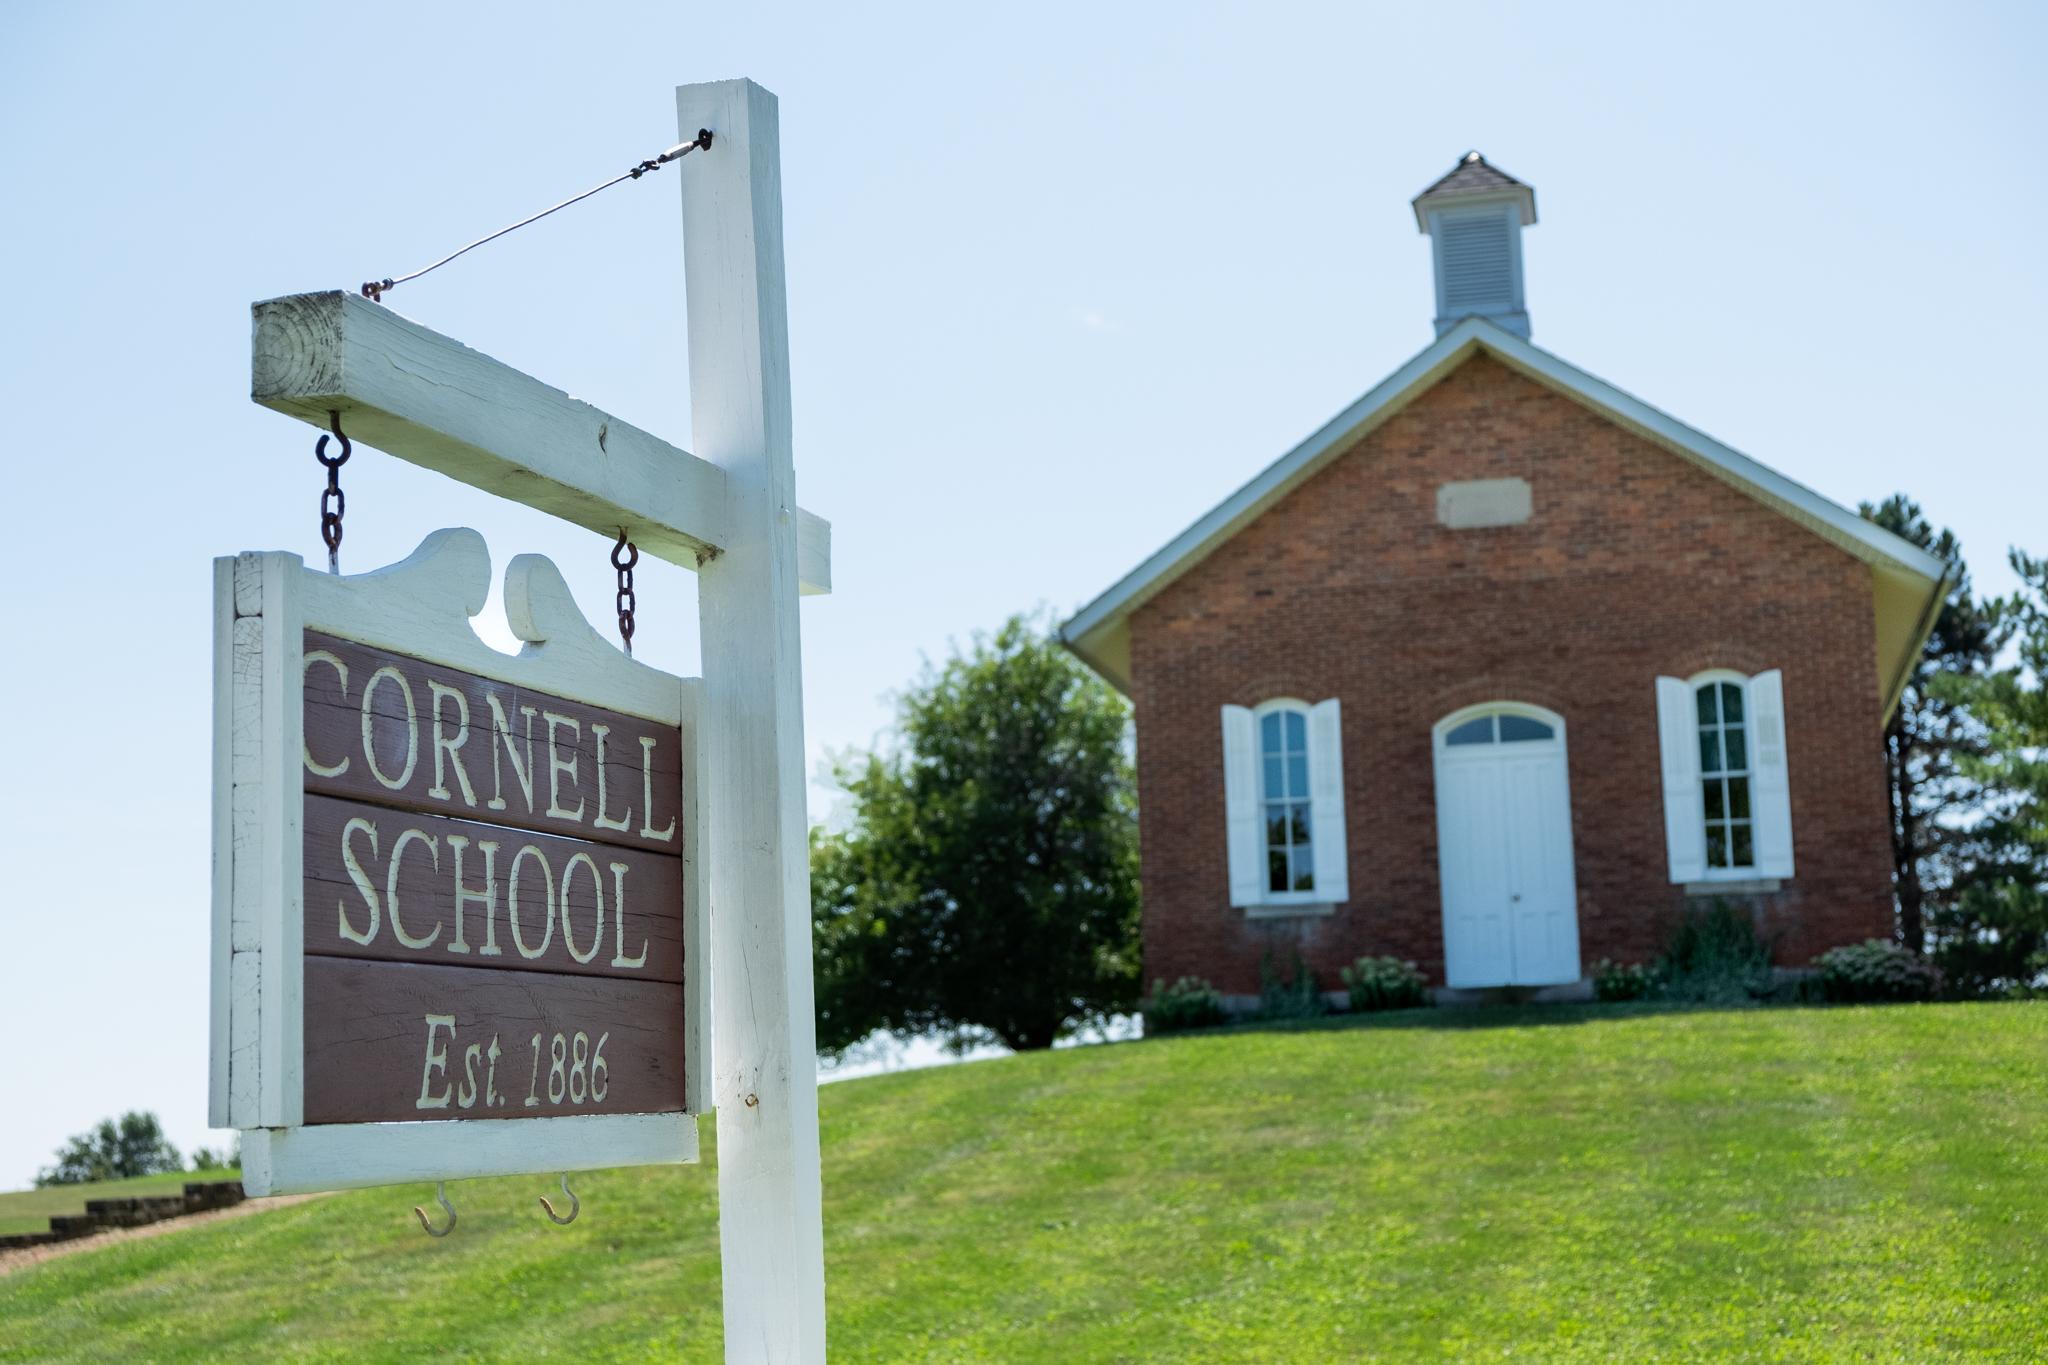 Johnstown_Cornell_School_Explore_Licking_County_Martin_Digital_0001.jpg